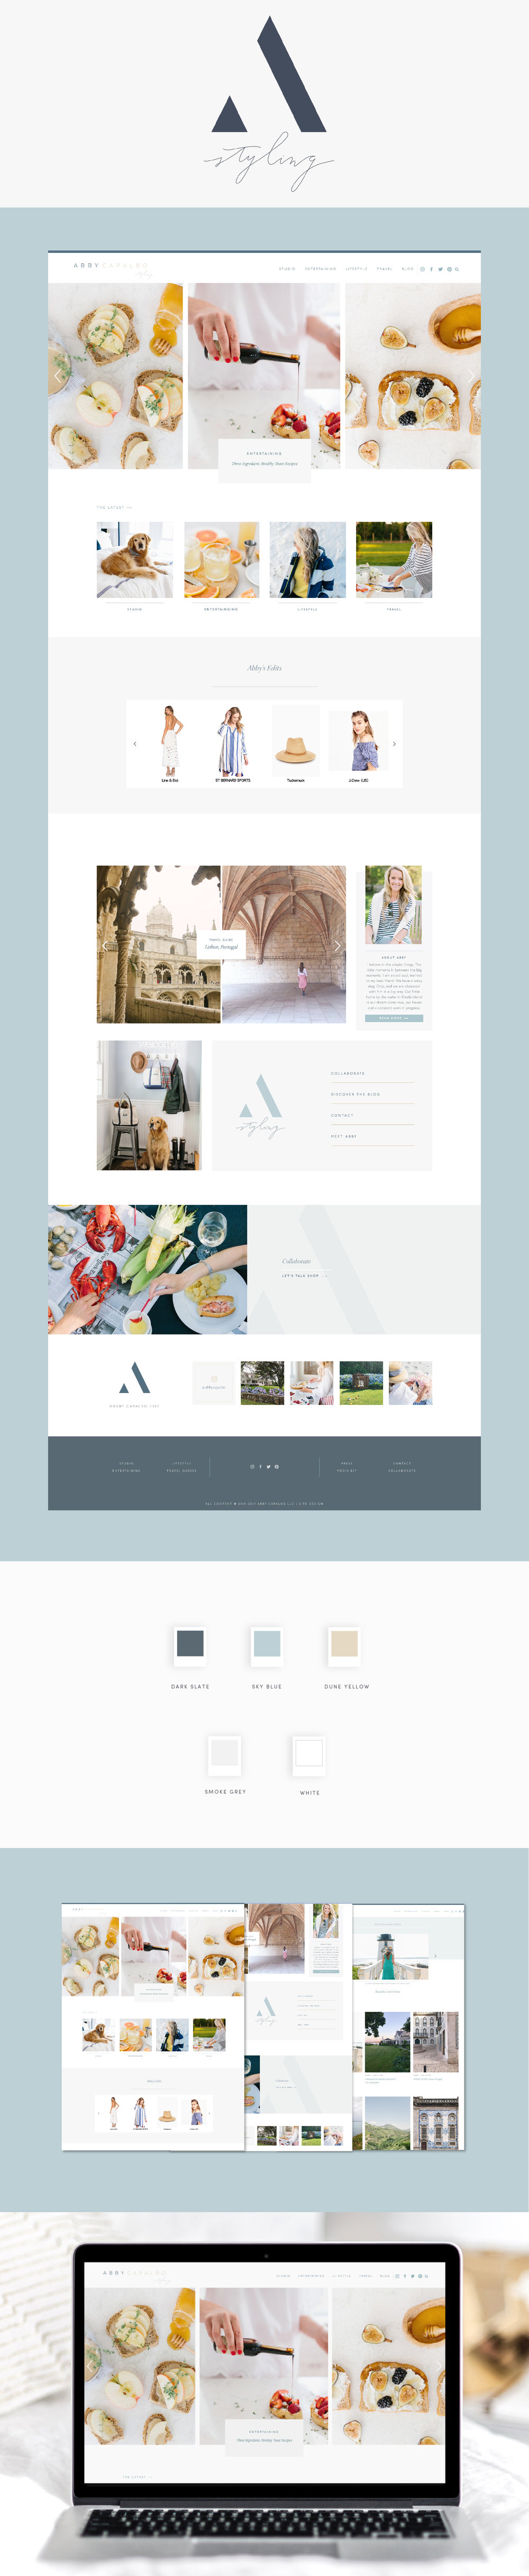 PortfolioSlide_Template